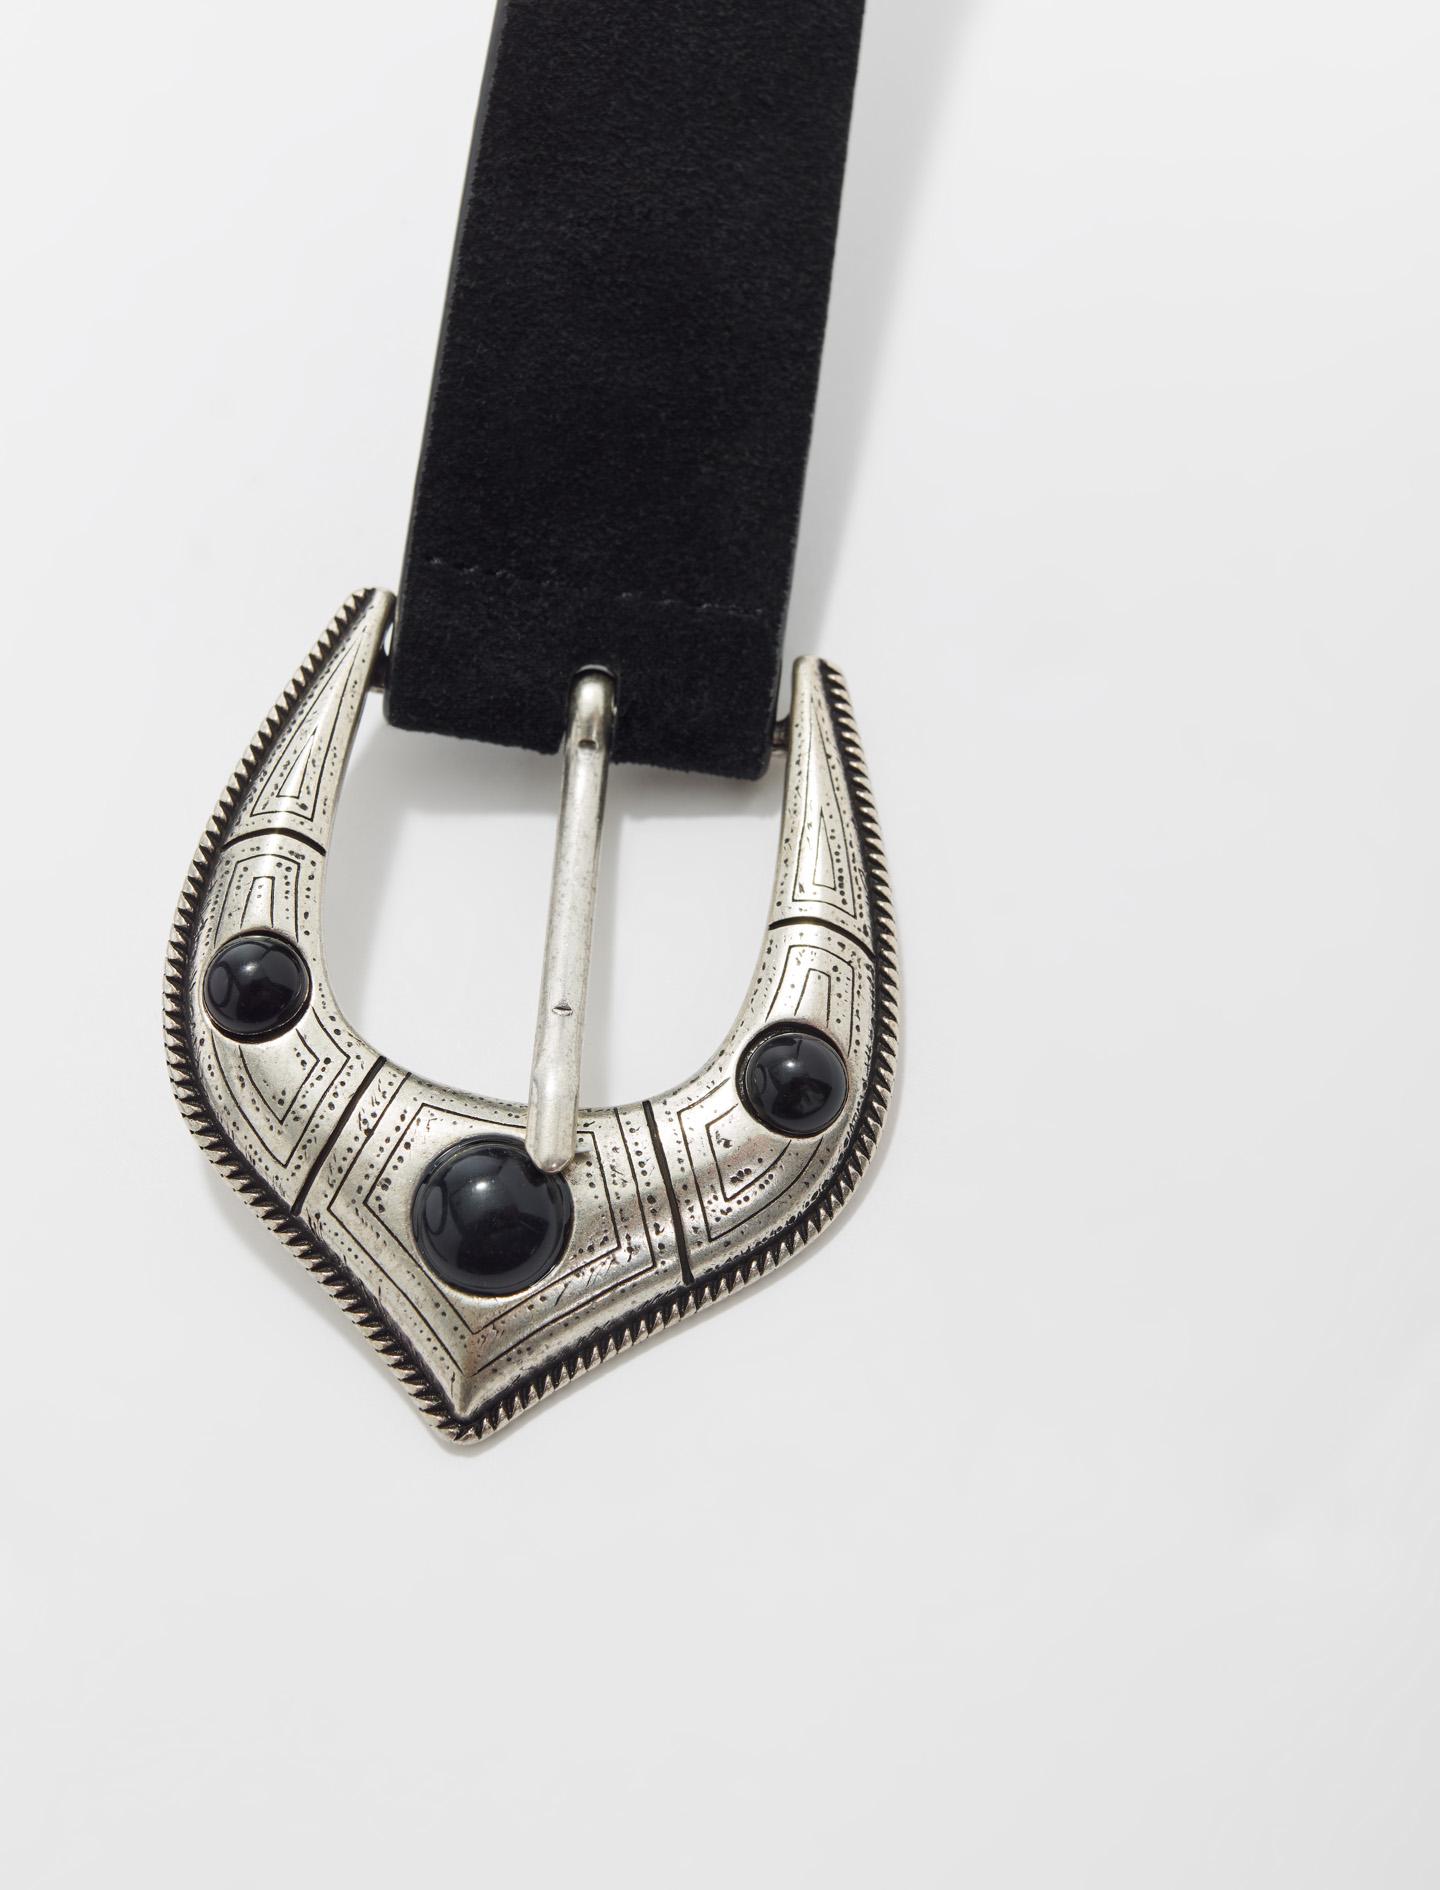 Berber style suede leather belt - Black